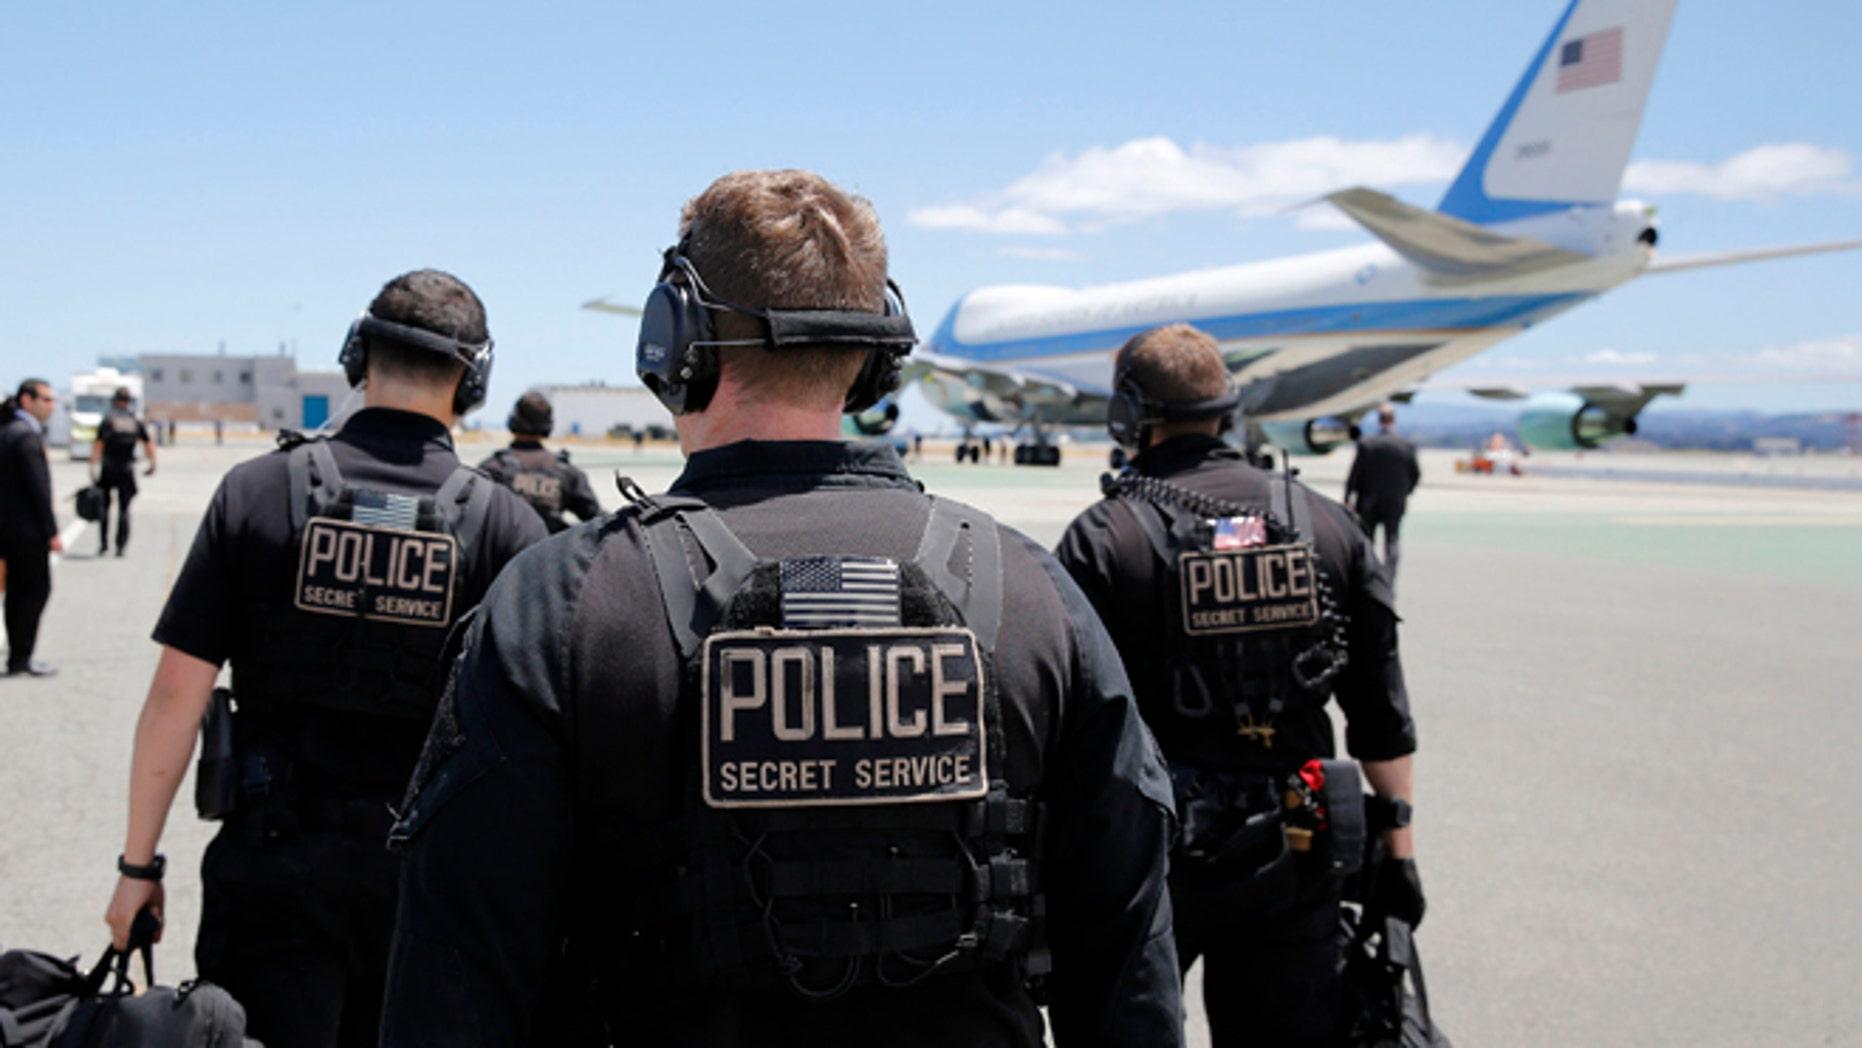 FILE: July 23, 2014: U.S. Secret Service employees walk toward Air Force One at San Francisco International Airport, San Francisco, Calif.